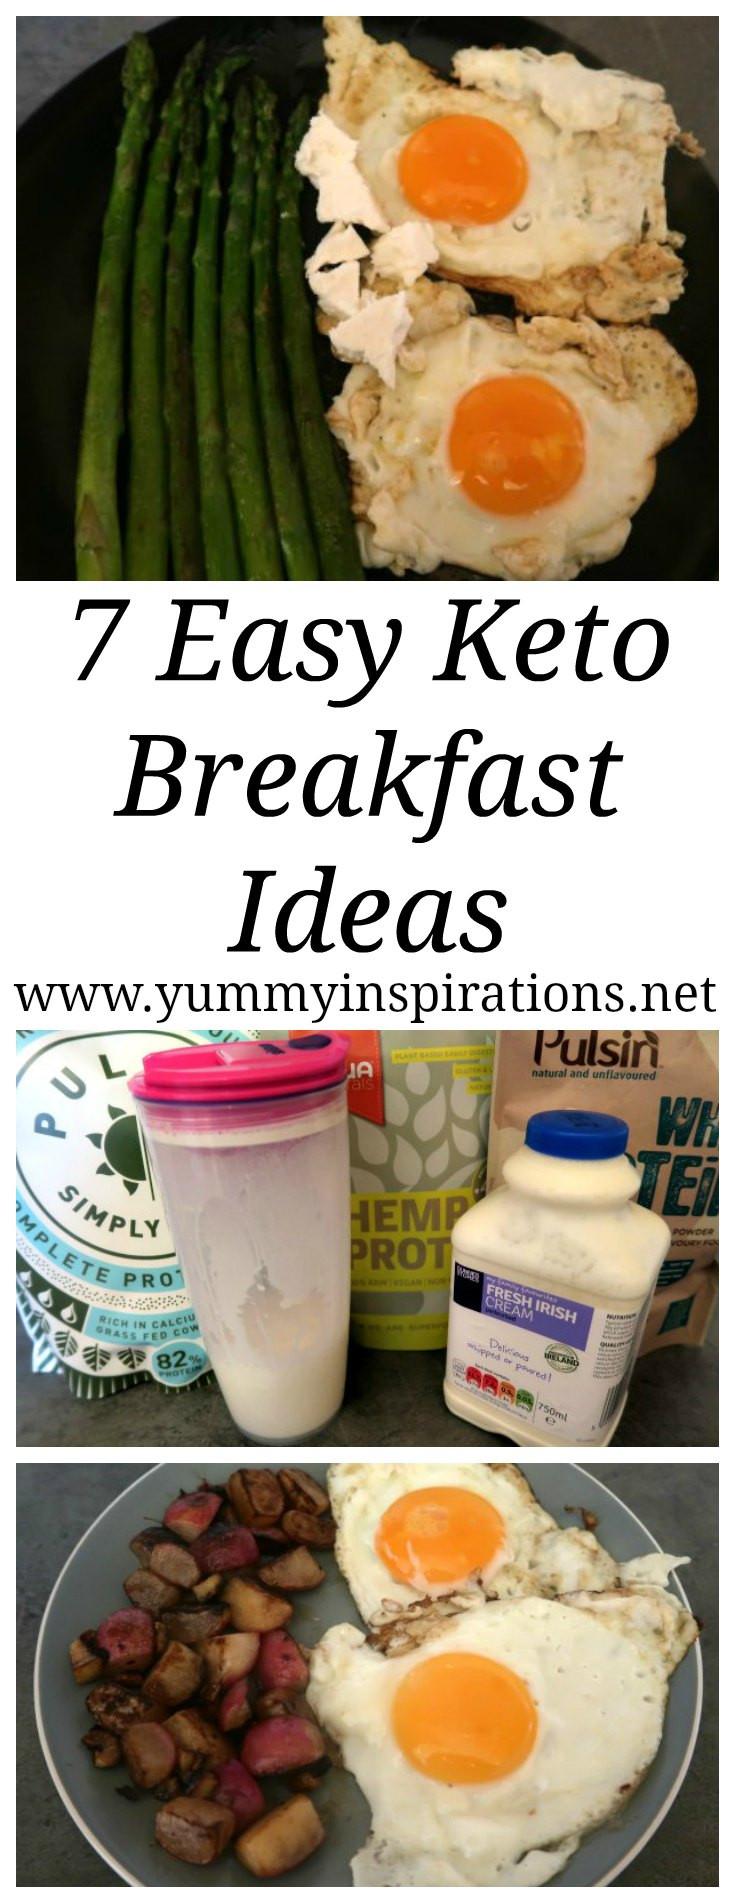 Breakfast Keto Recipes  7 Easy Keto Breakfast Ideas Low Carb & Ketogenic Diet